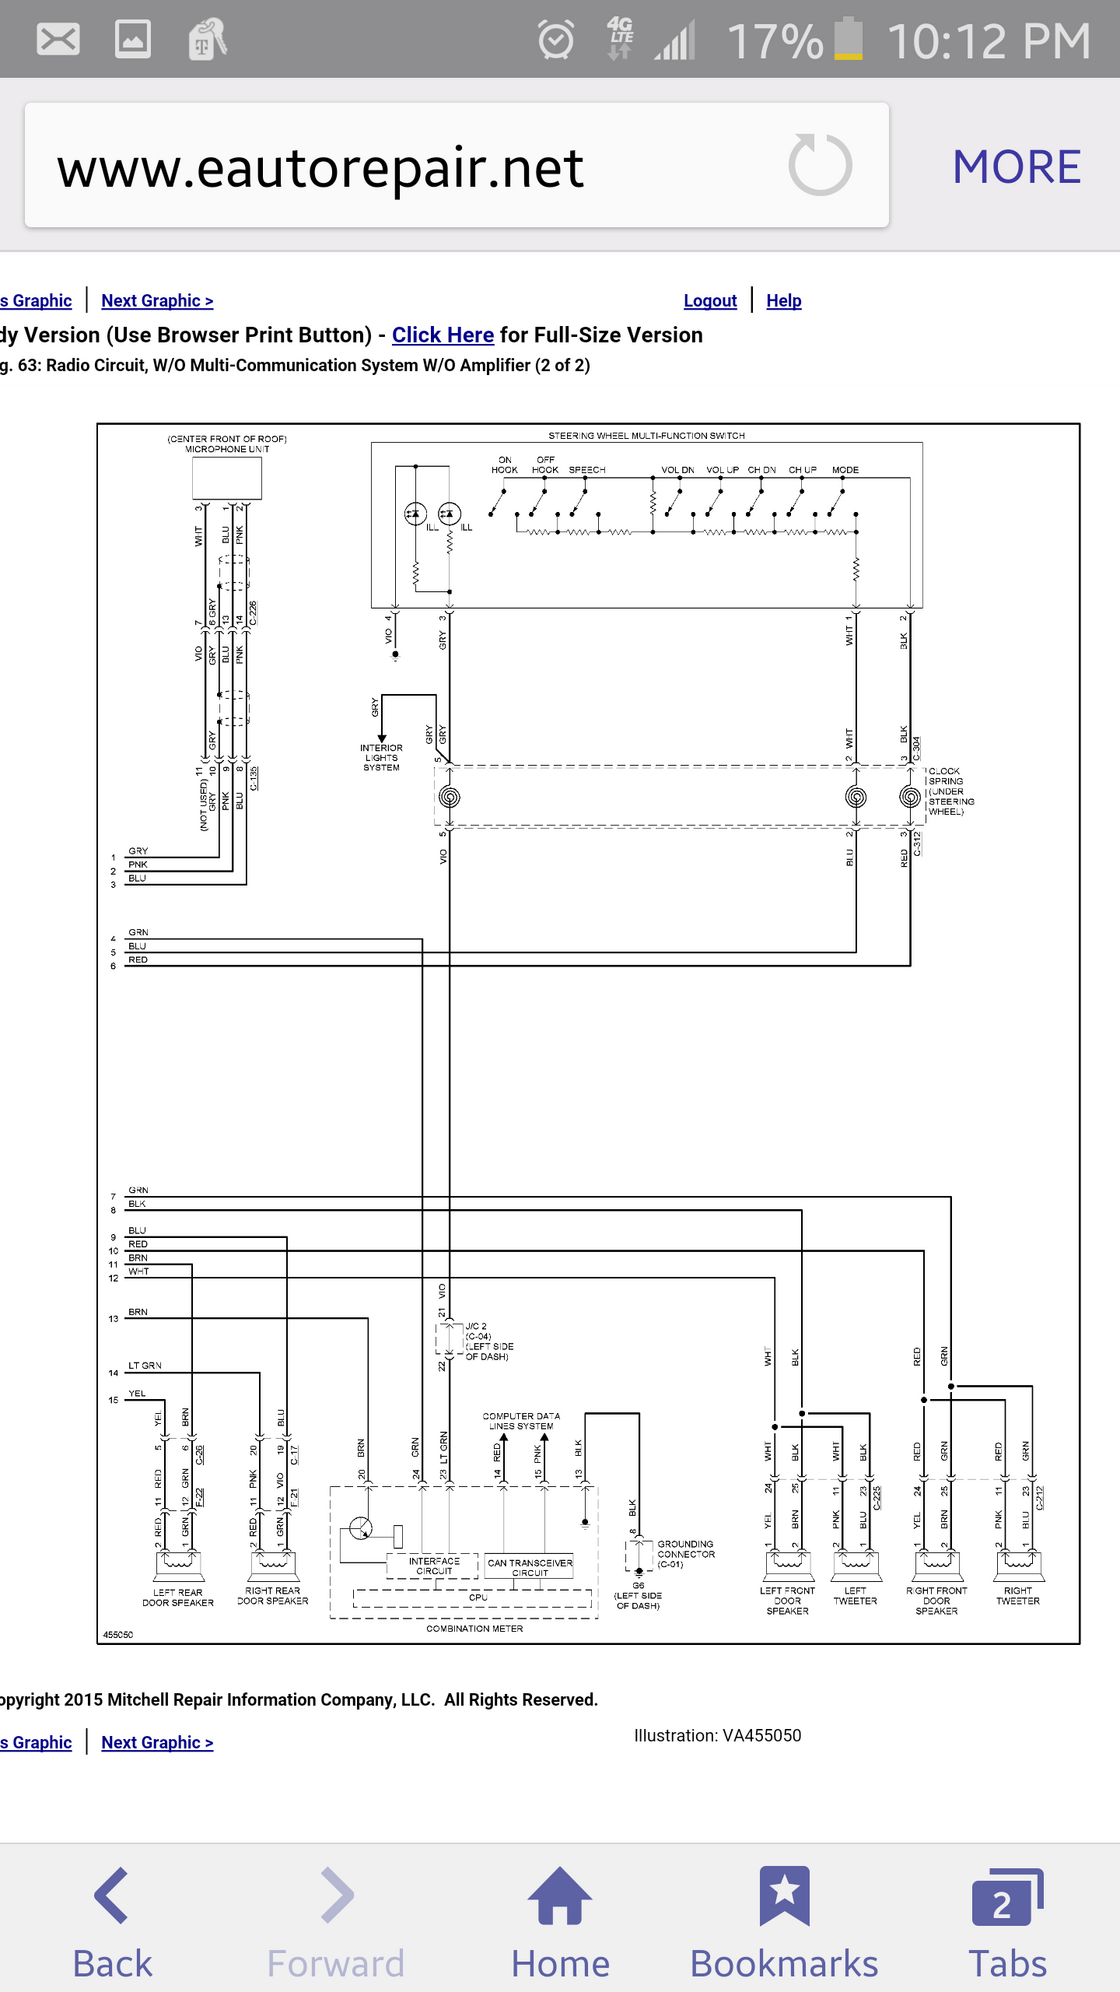 beautiful sullair generator wiring diagram ideas electrical Demag Wiring Diagram sullair es8 wiring diagram Saylor Beall Wiring Diagram Western Snow Plow Wiring Diagram Ford New Holland Wiring Diagram